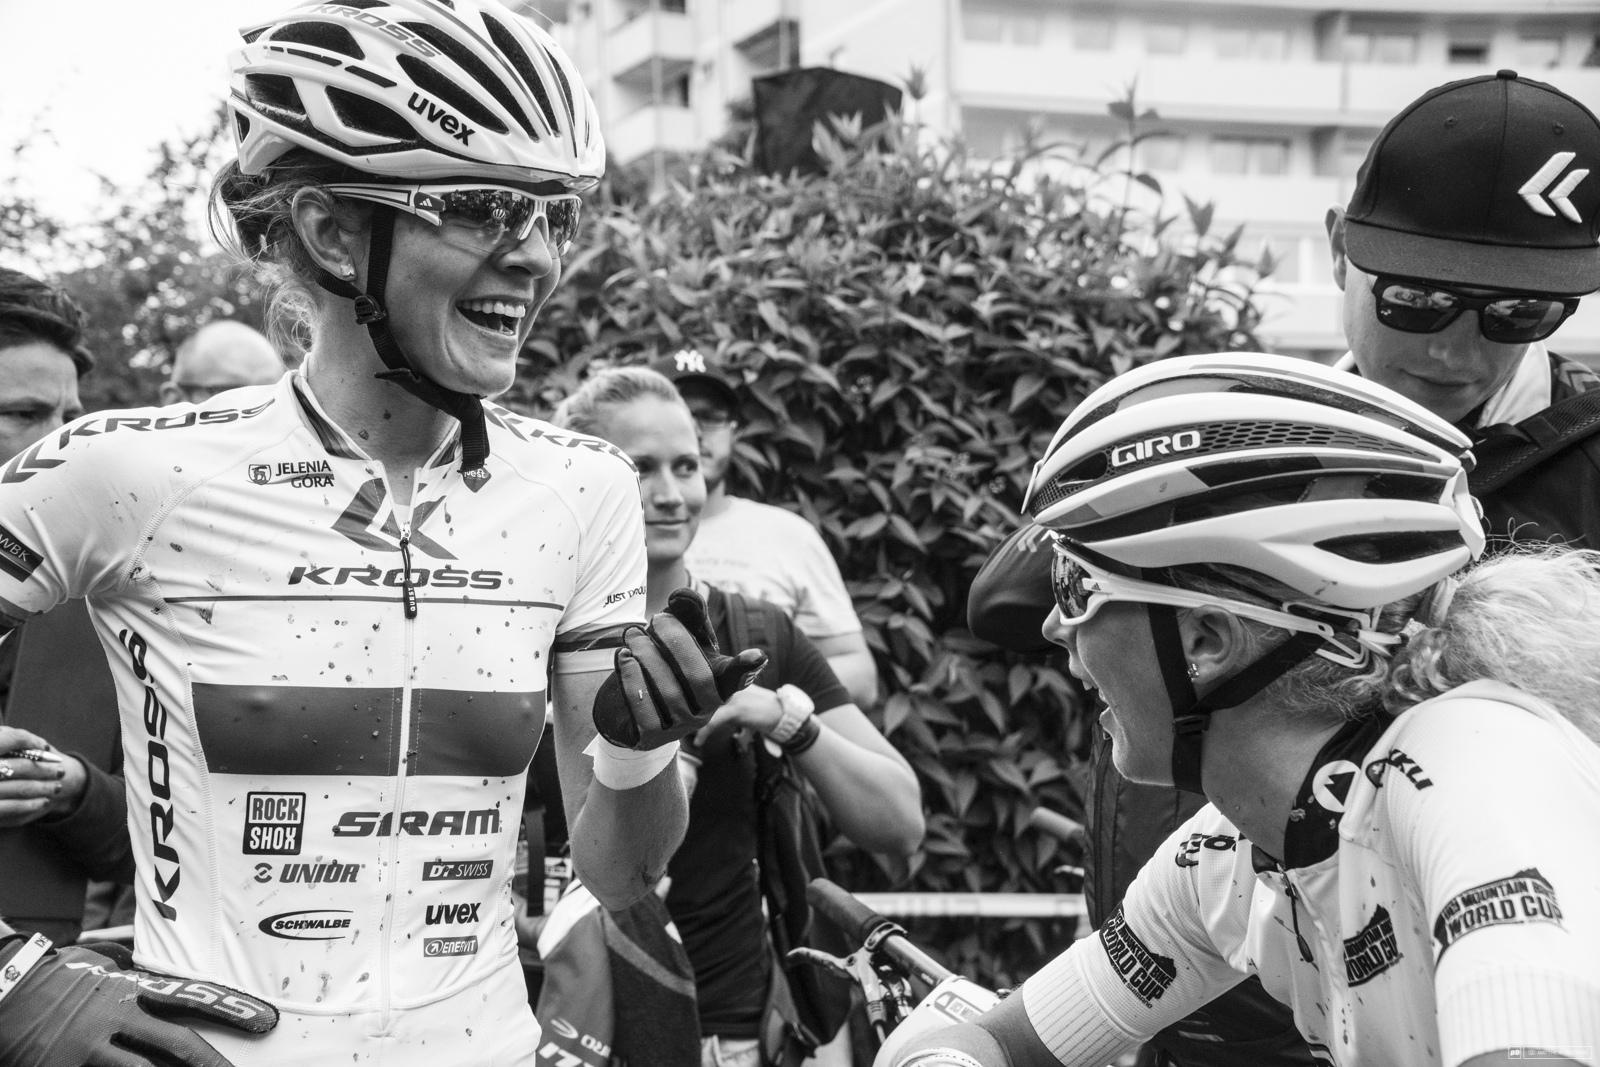 Mia and Jolanda share a laugh at the finish.